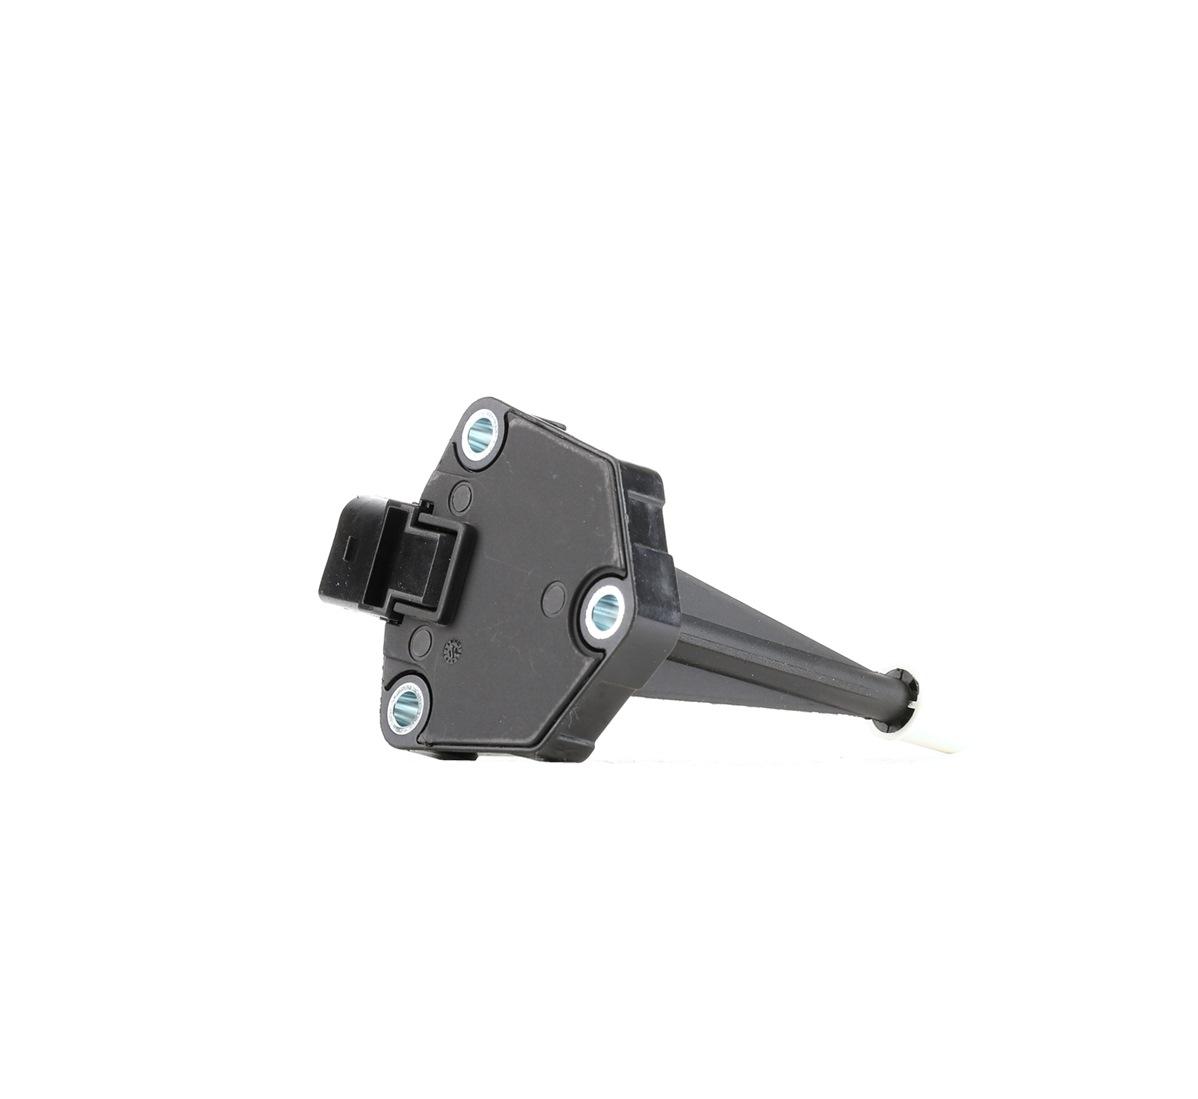 Ölniveausensor RIDEX 1289S0022